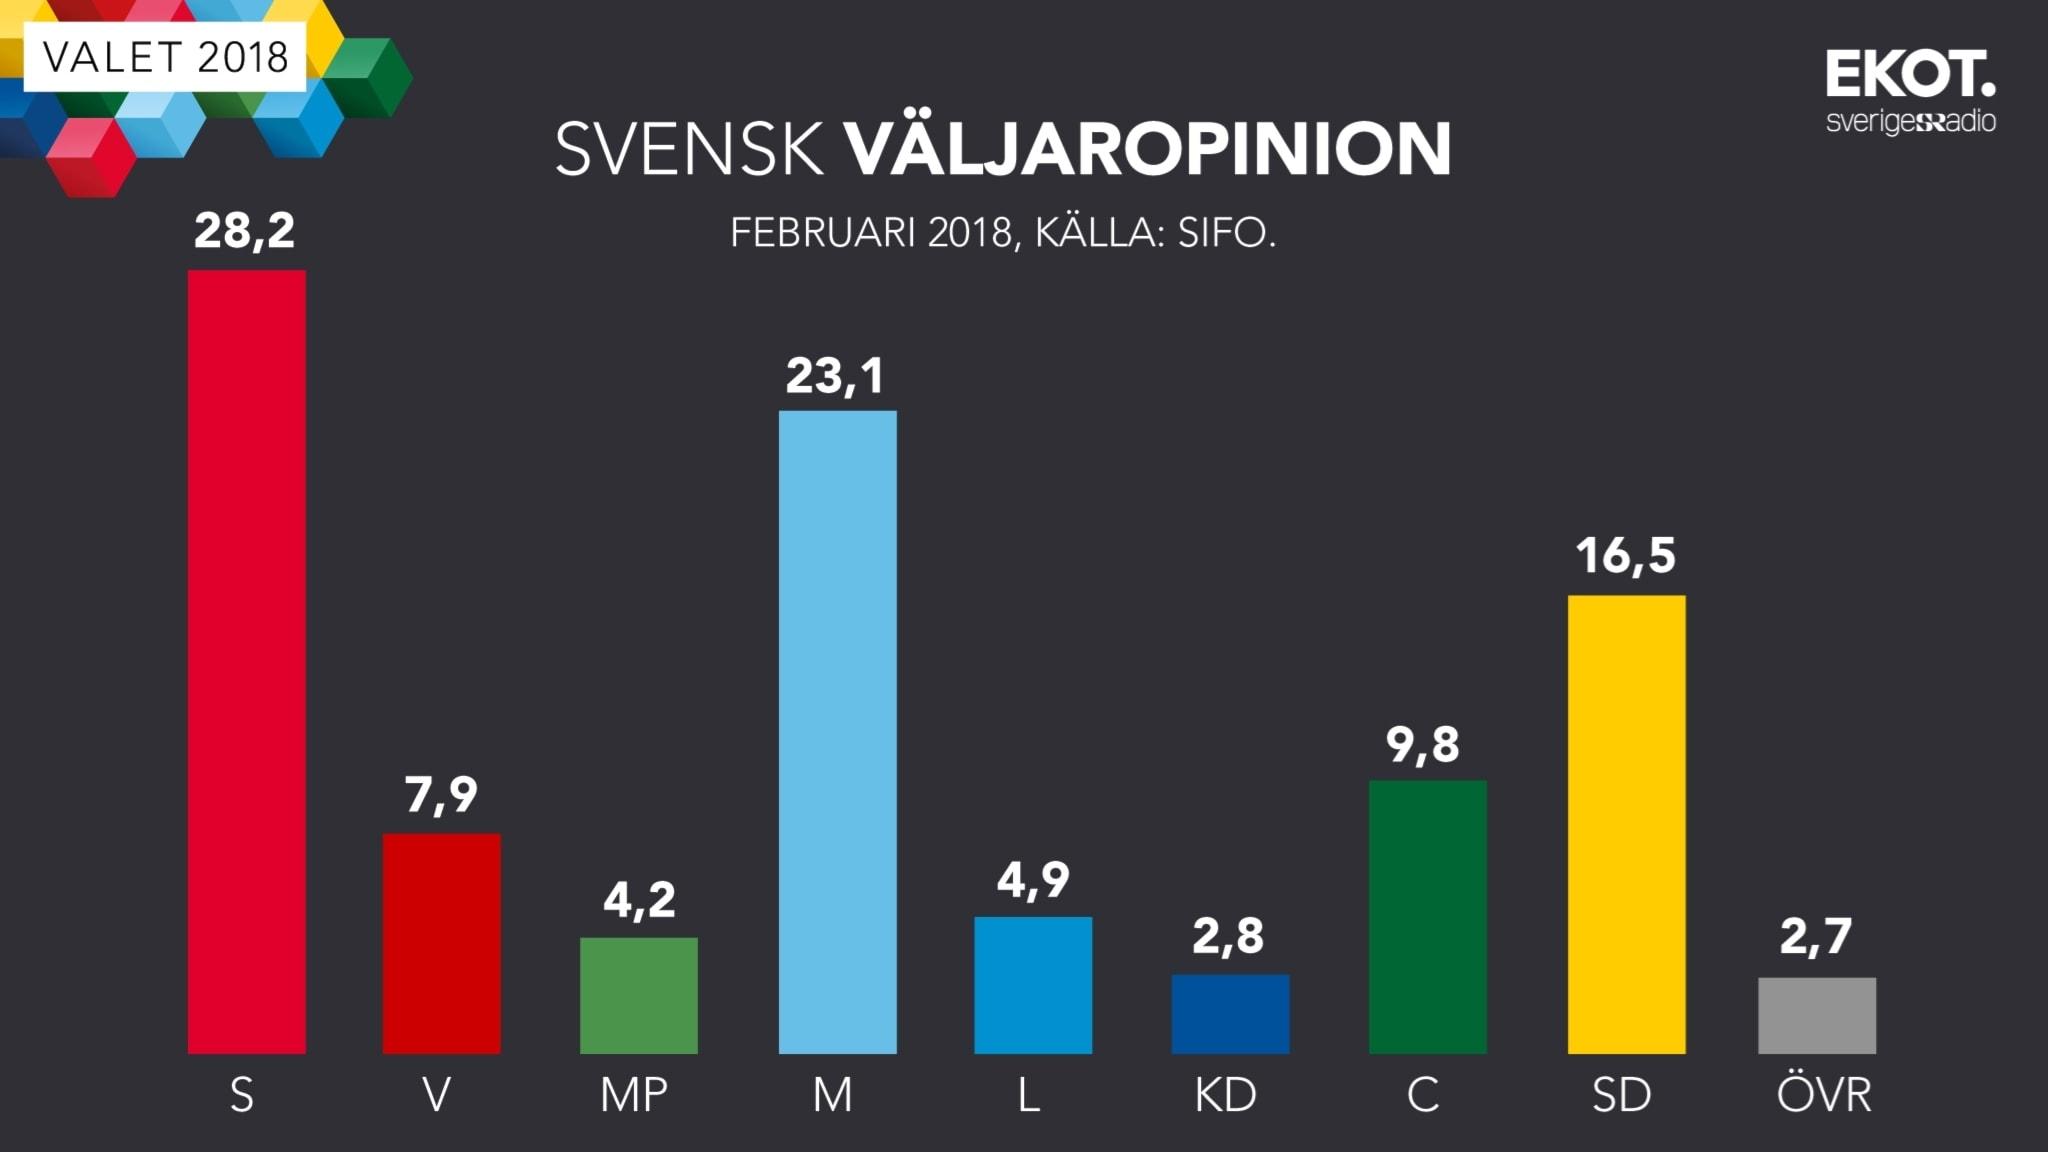 Grafik  Svensk V U00e4ljaropinion  Februari 2018